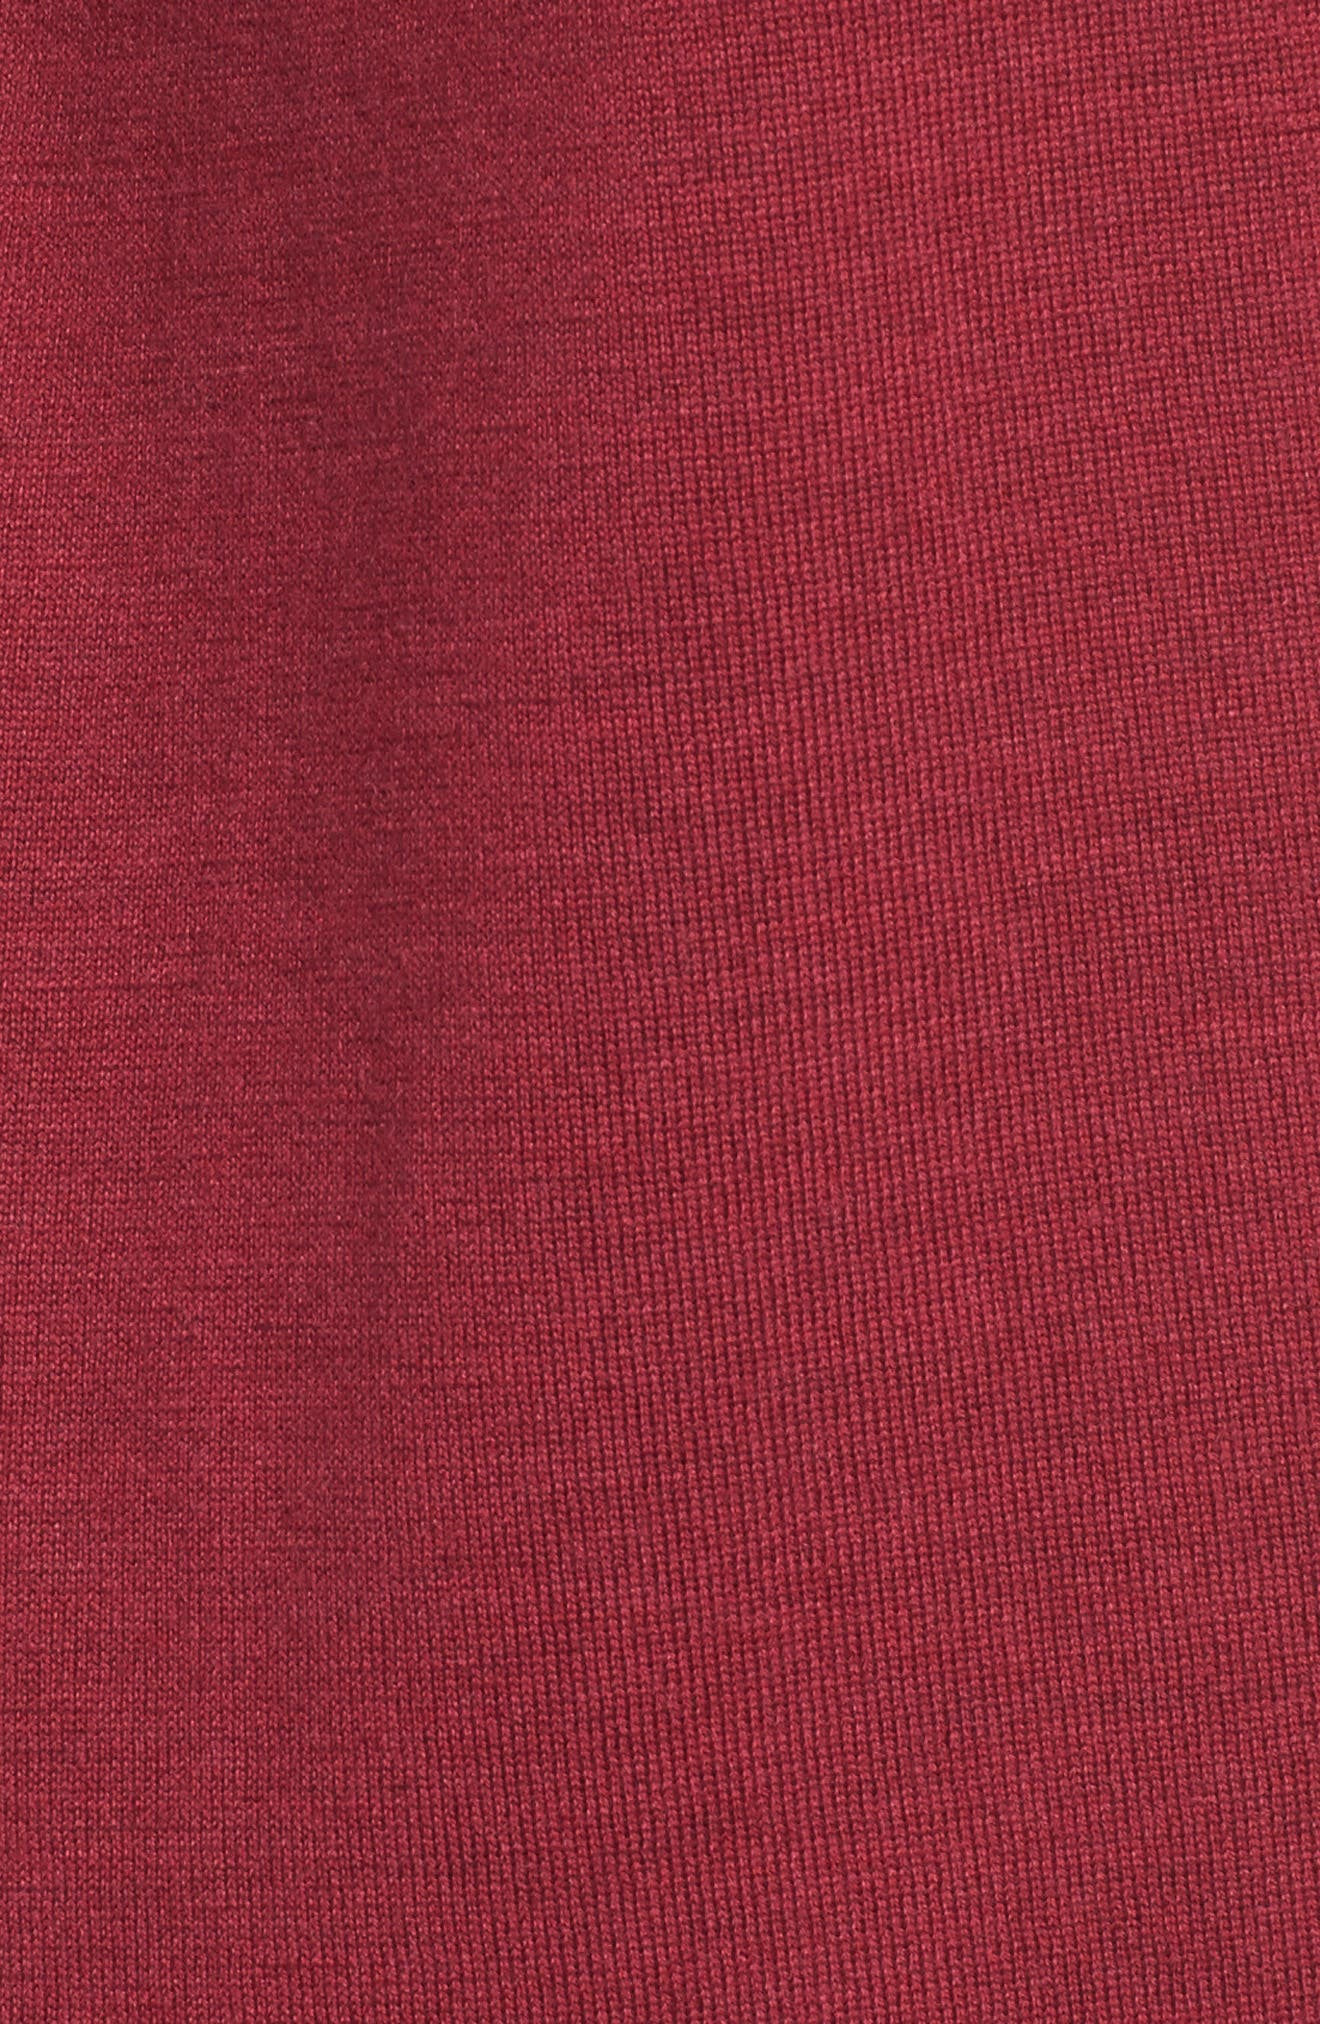 Merino Wool Tunic Sweater,                             Alternate thumbnail 35, color,